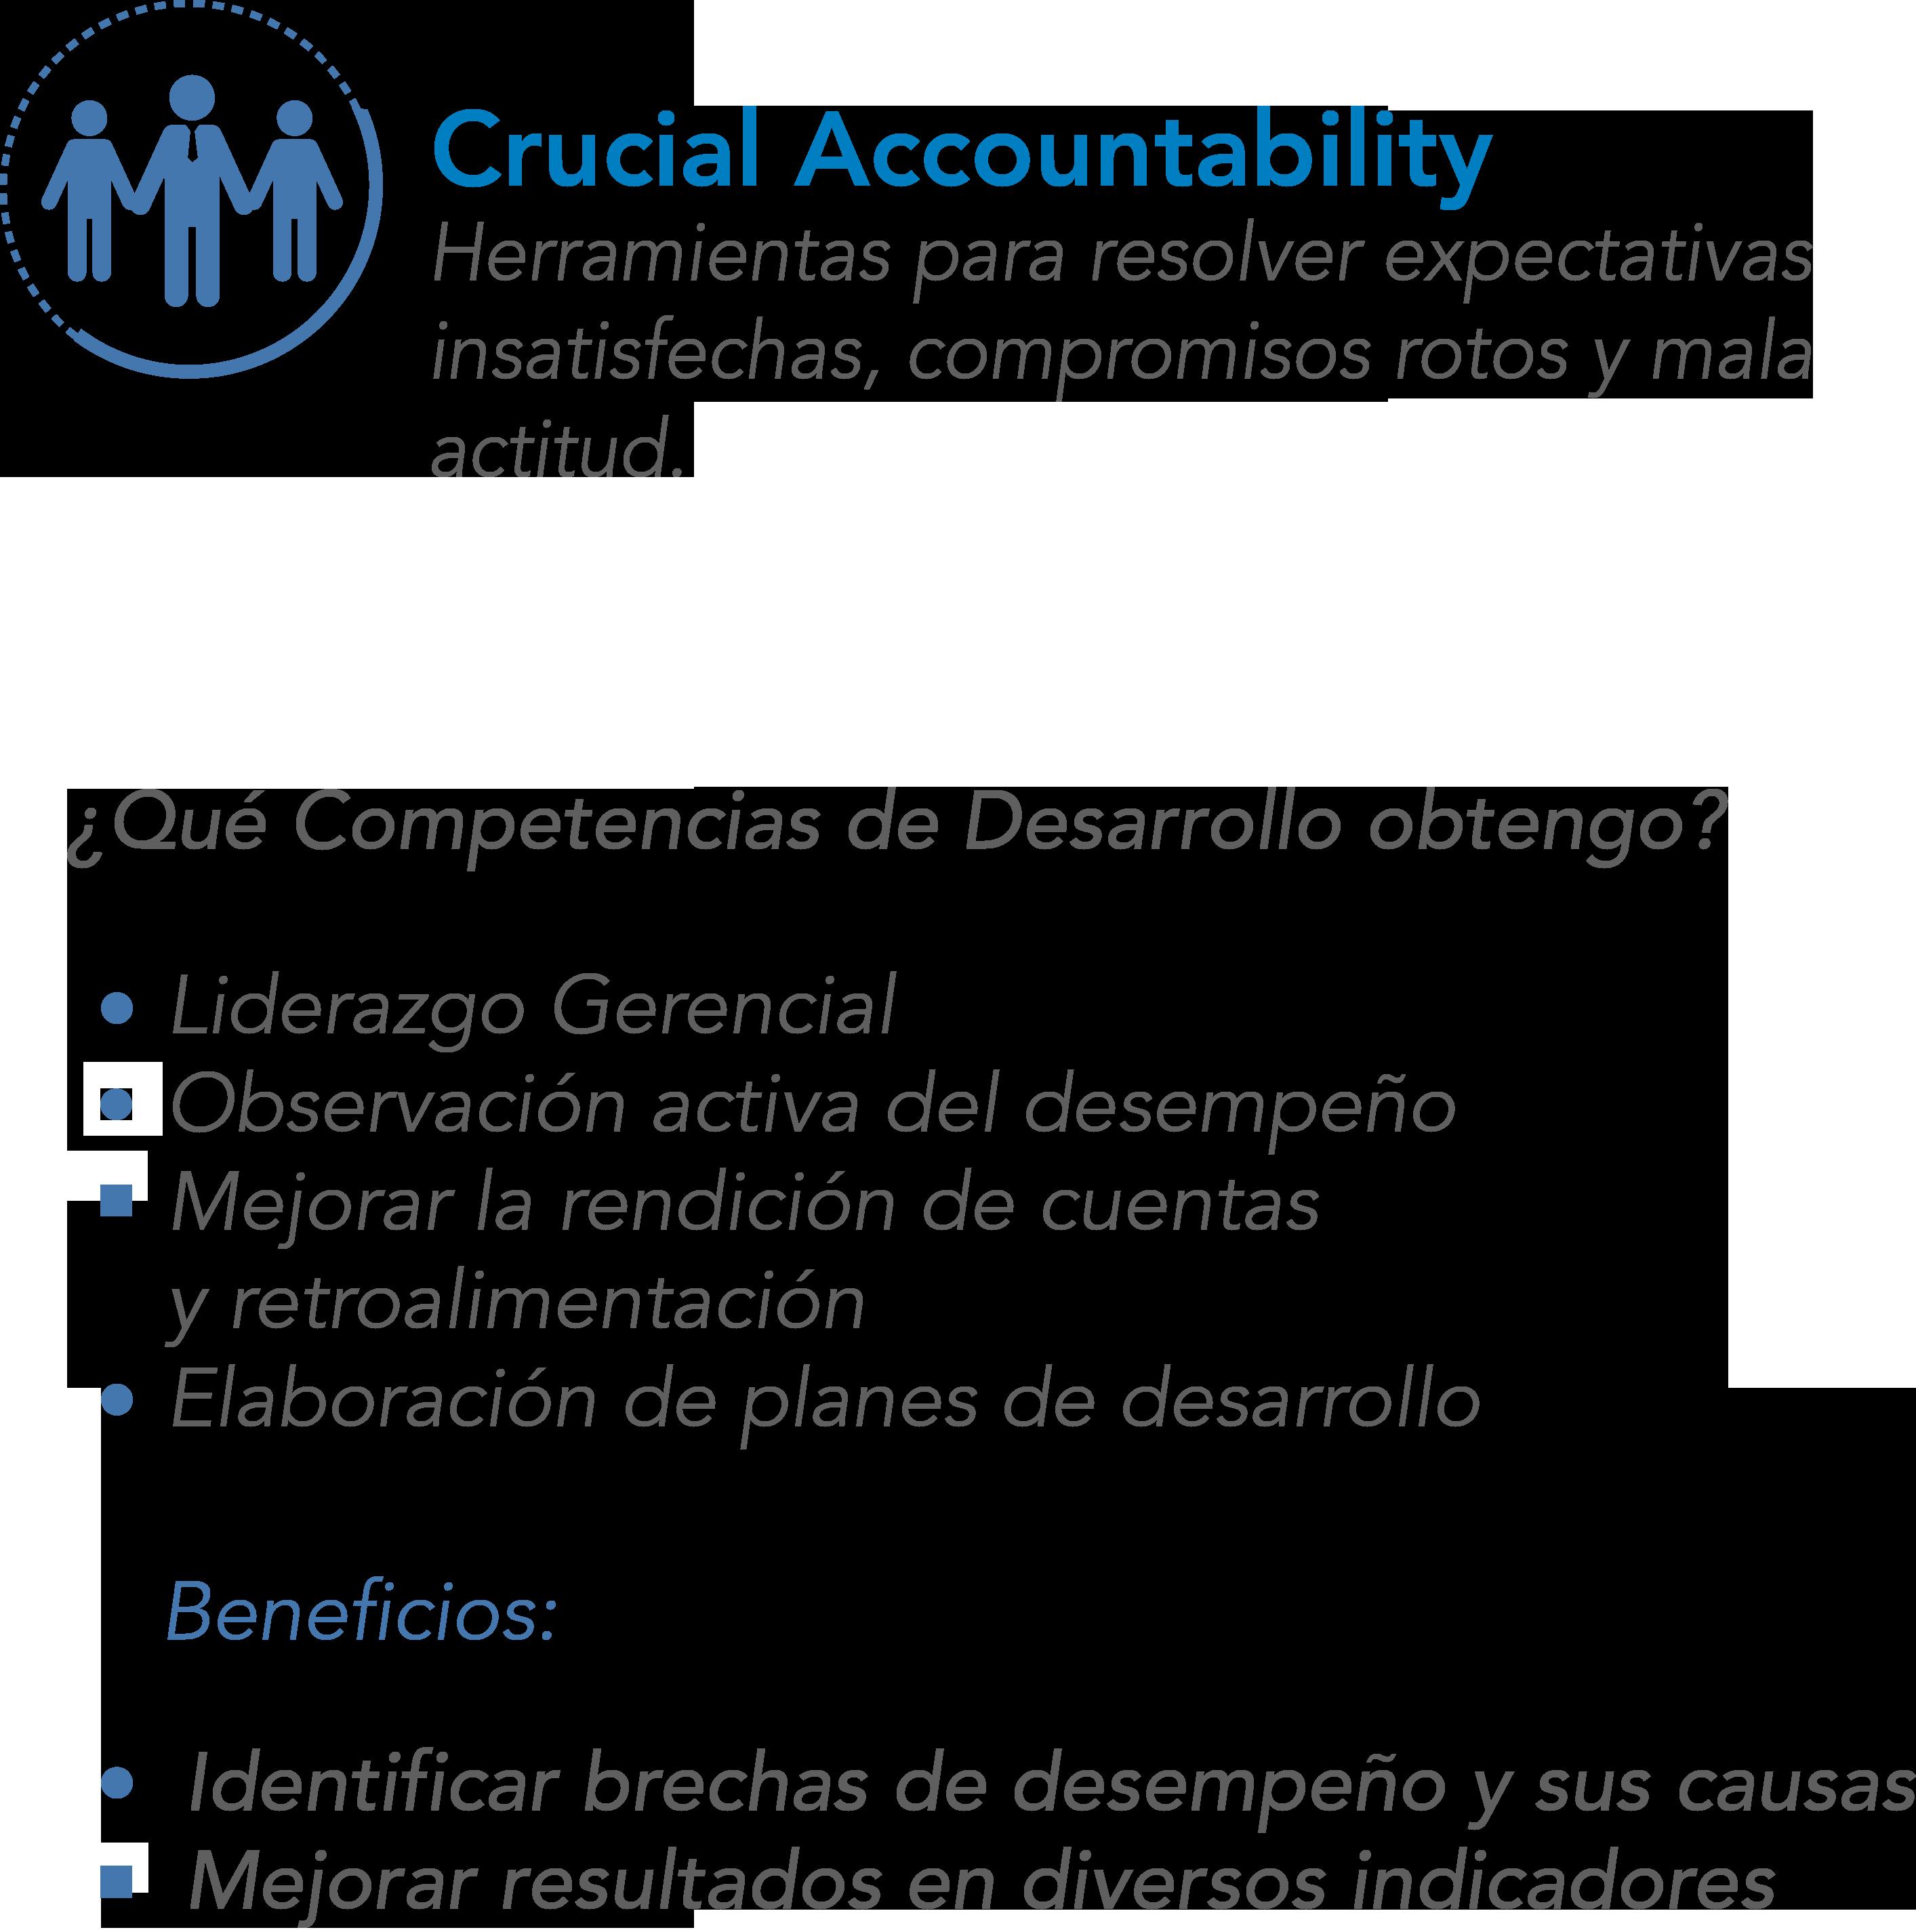 crucial-accountability-2